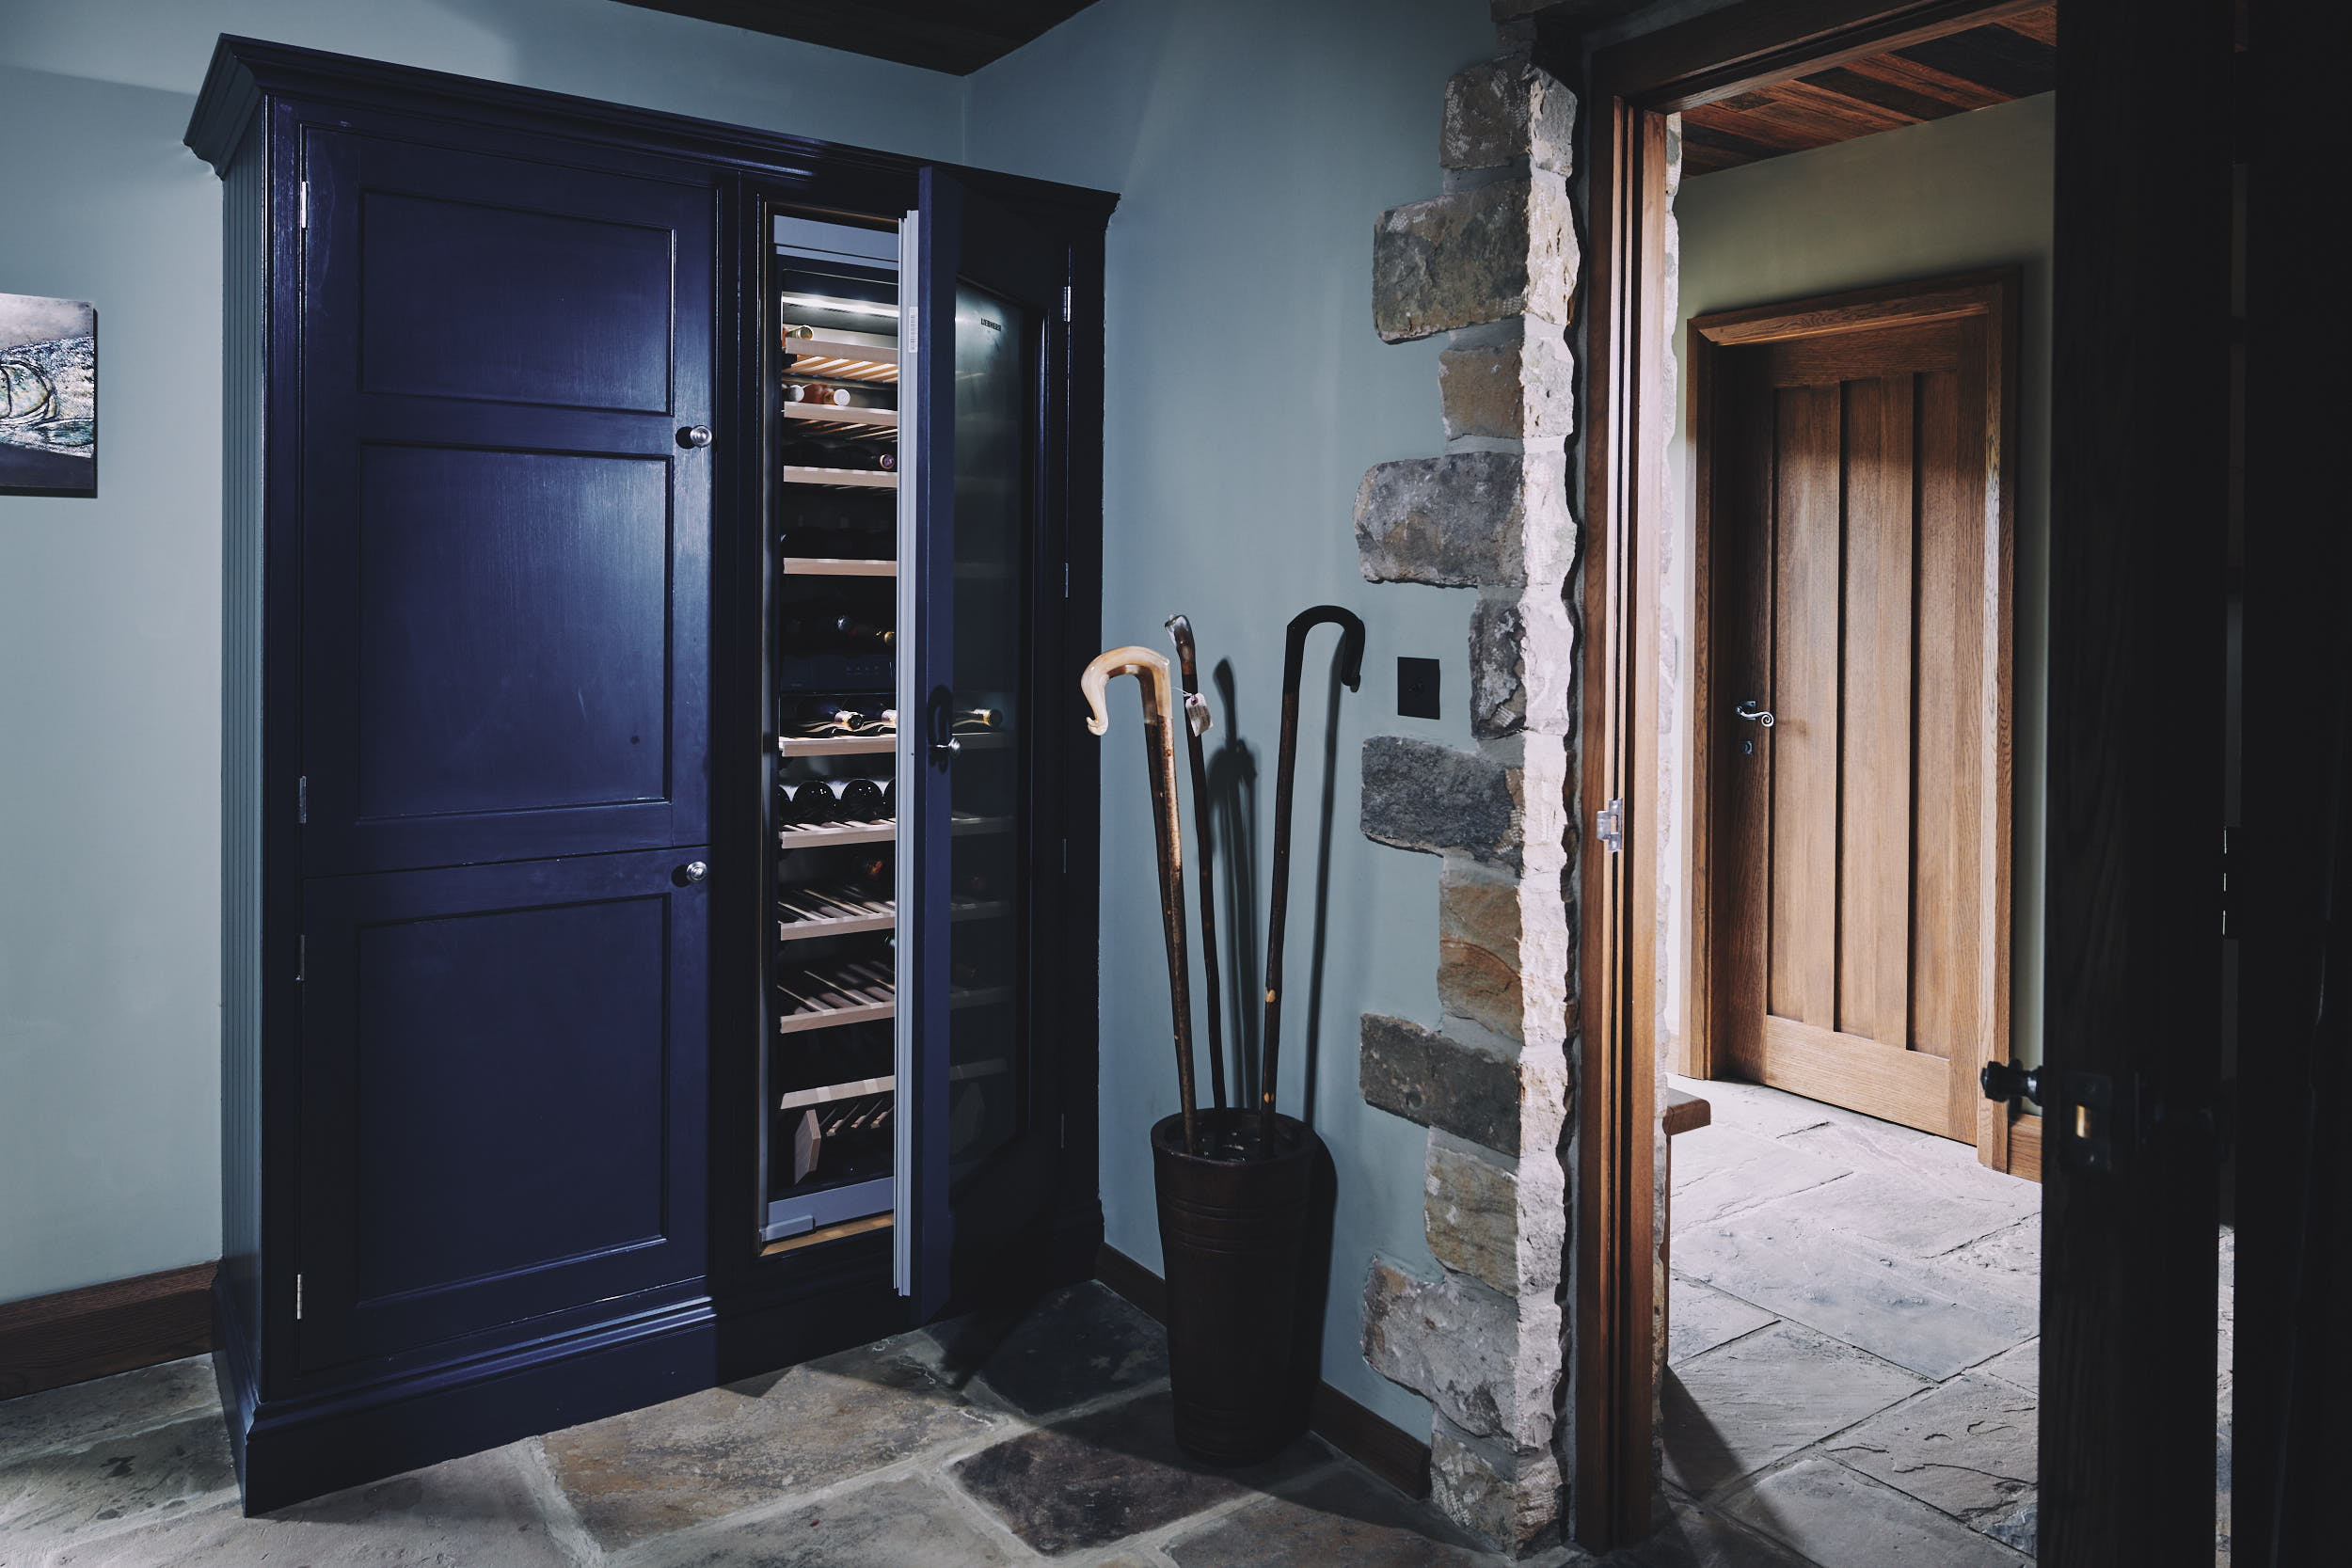 interior photography of luxury bespoke homes by matthew lloyd3177.jpg